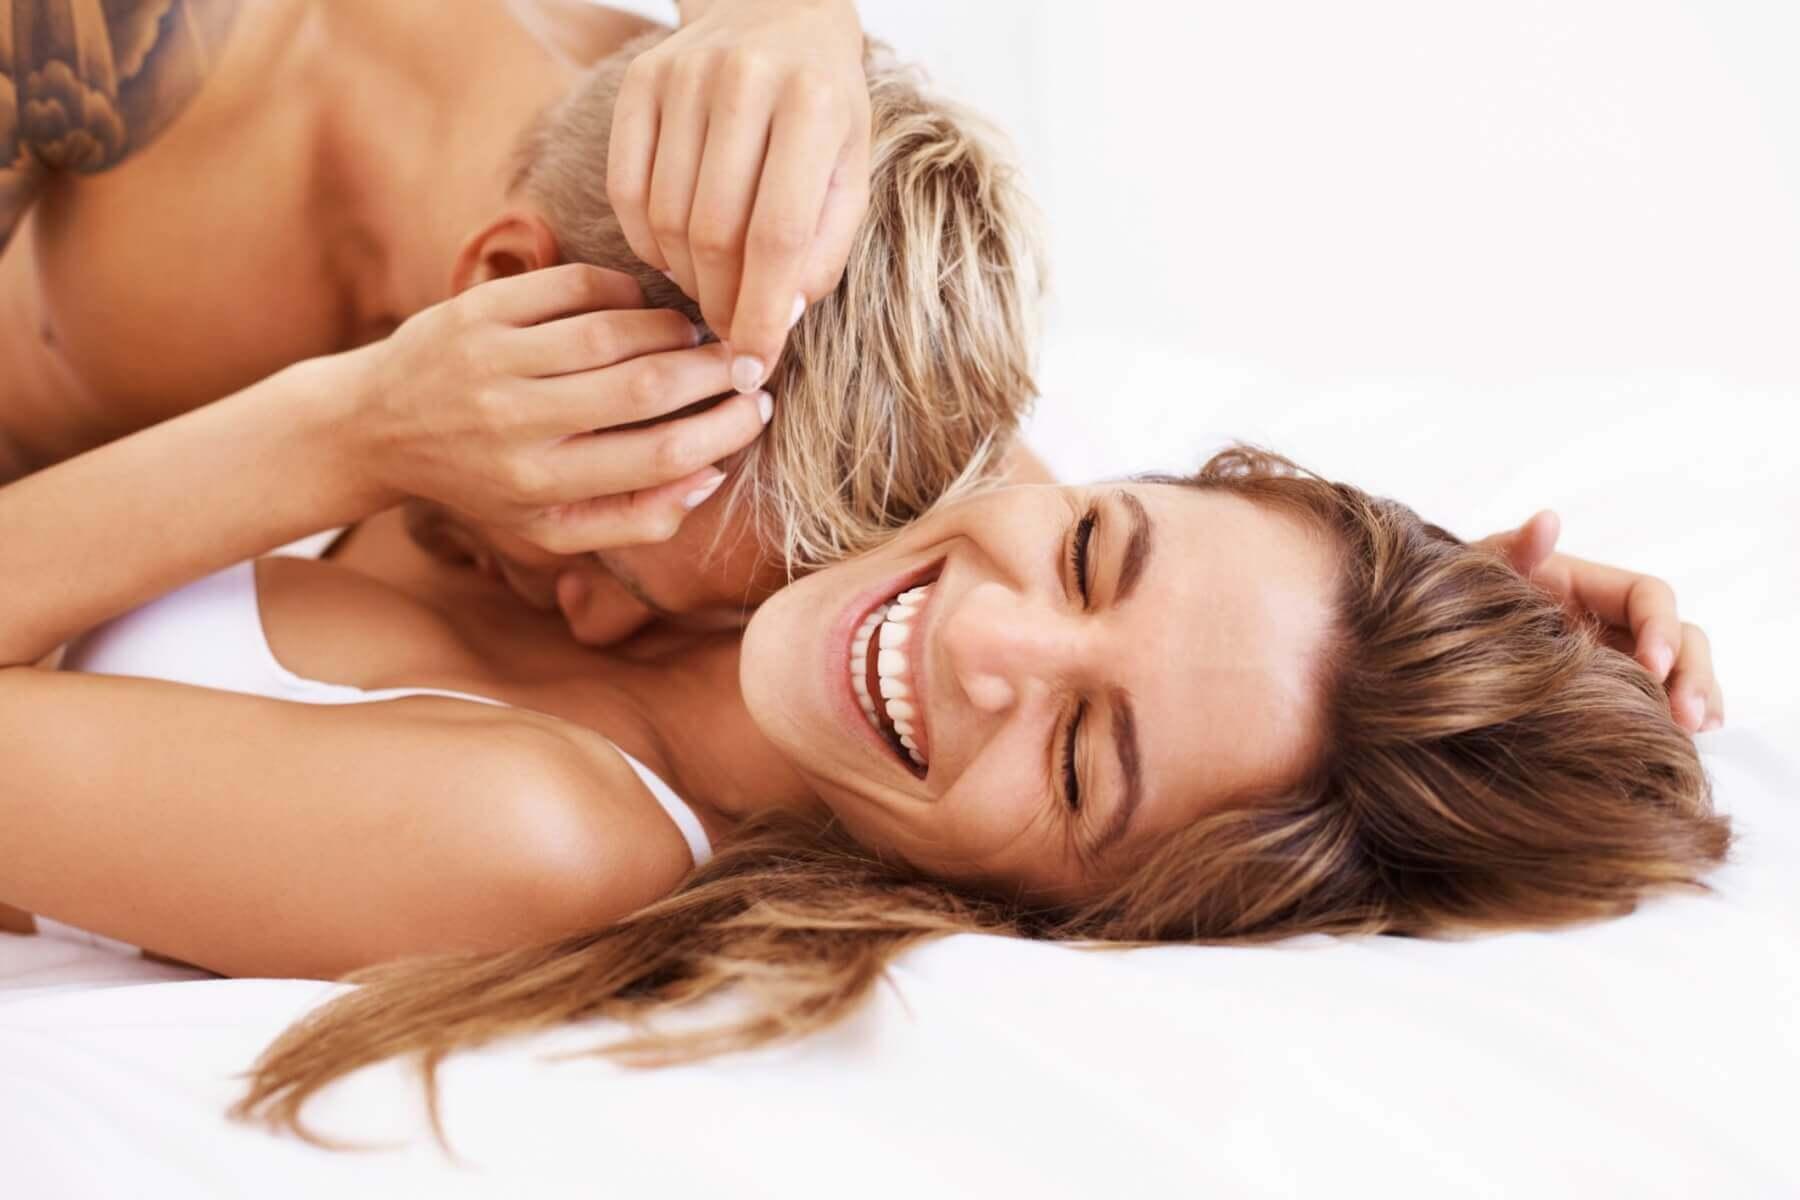 Par har det sjovt i sengen